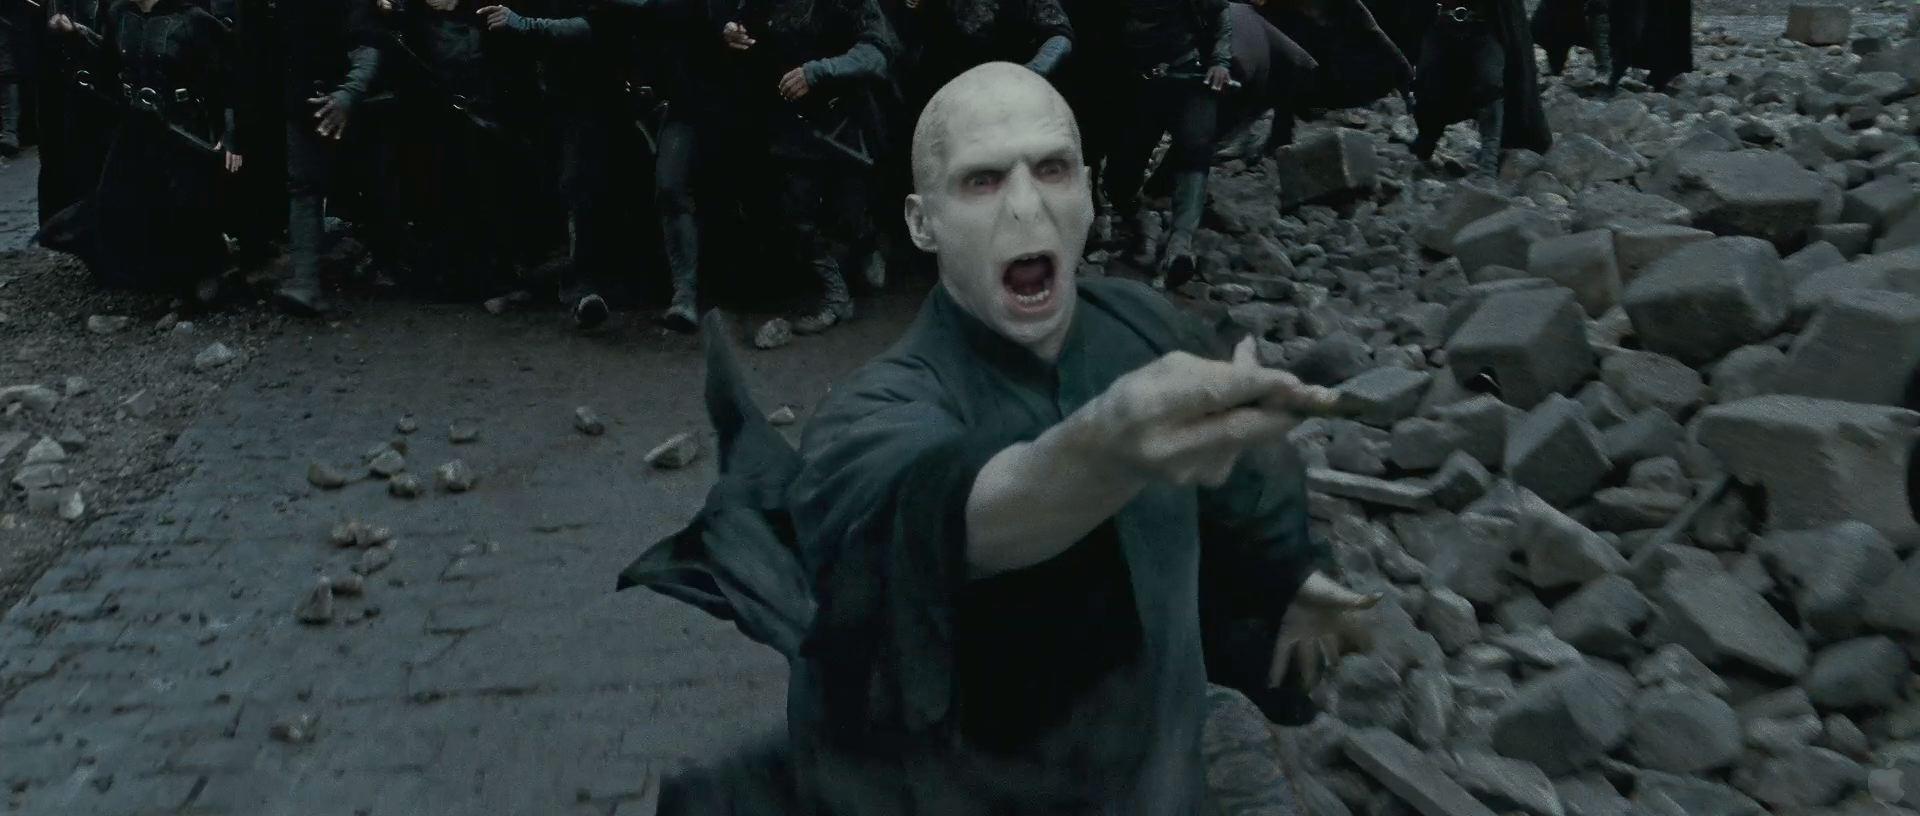 Harry Potter BlogHogwarts HP7 2 Trailer 89